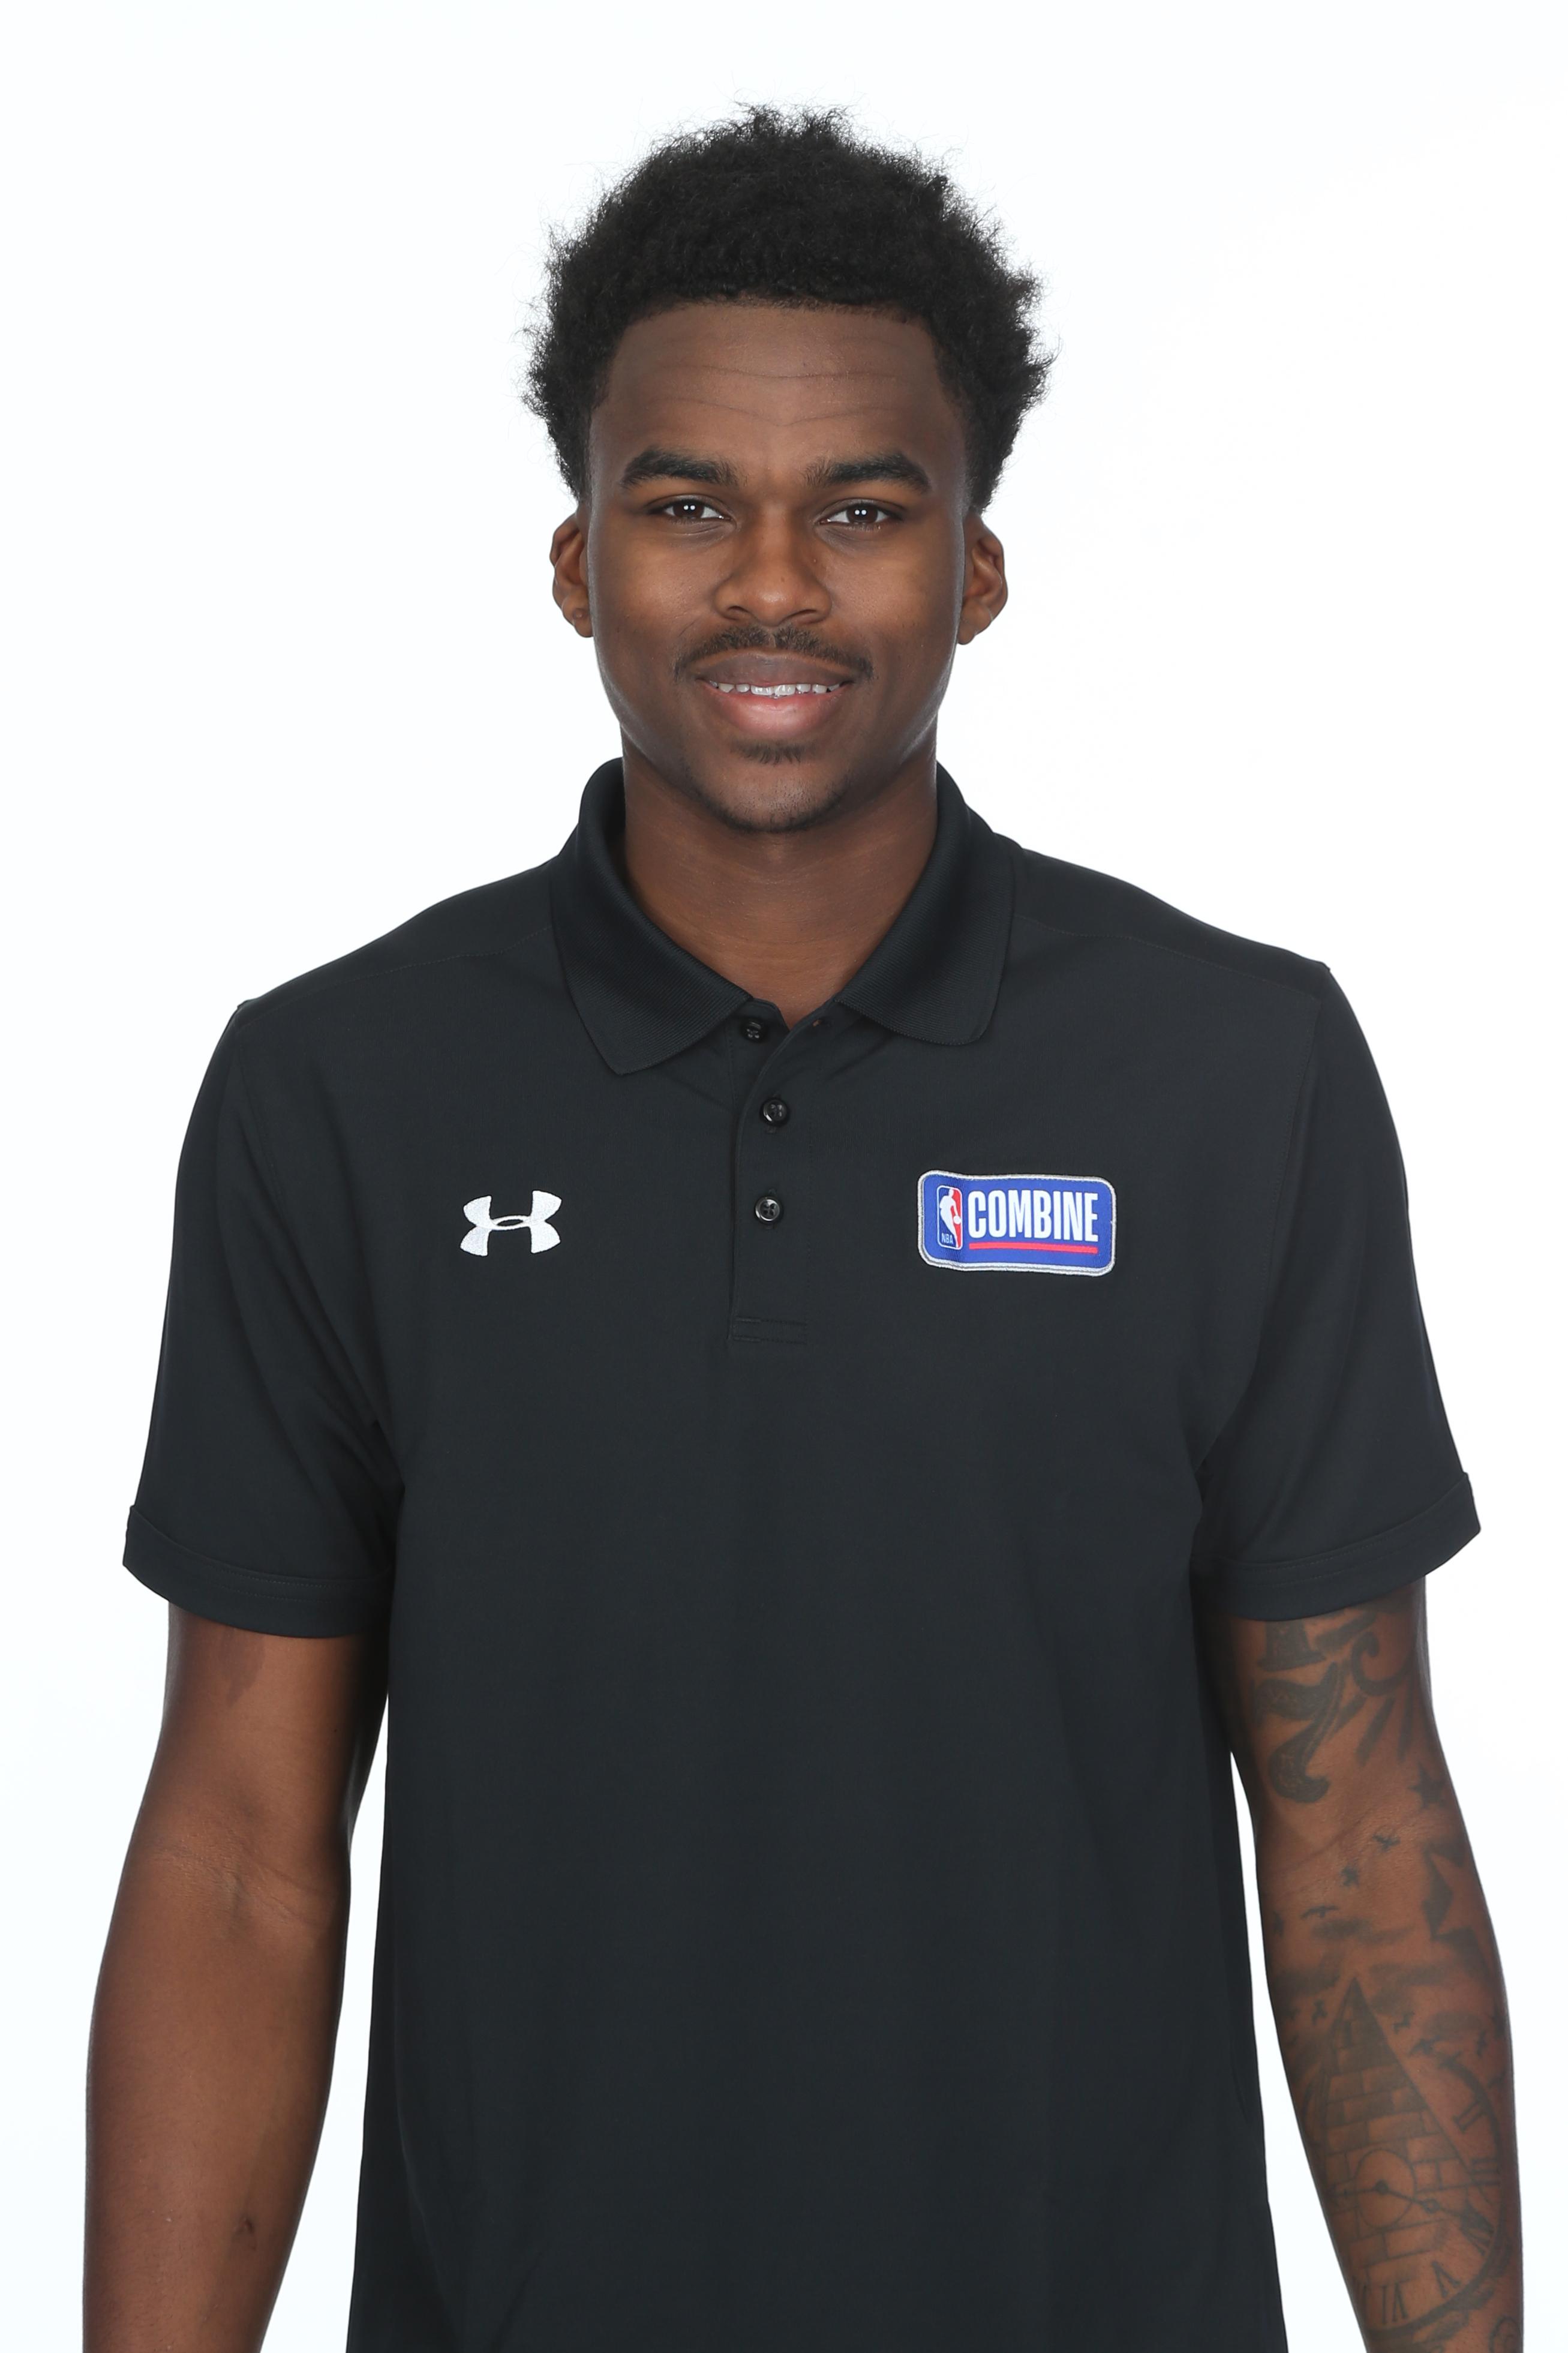 2019 NBA Draft Combine - Medical Portraits